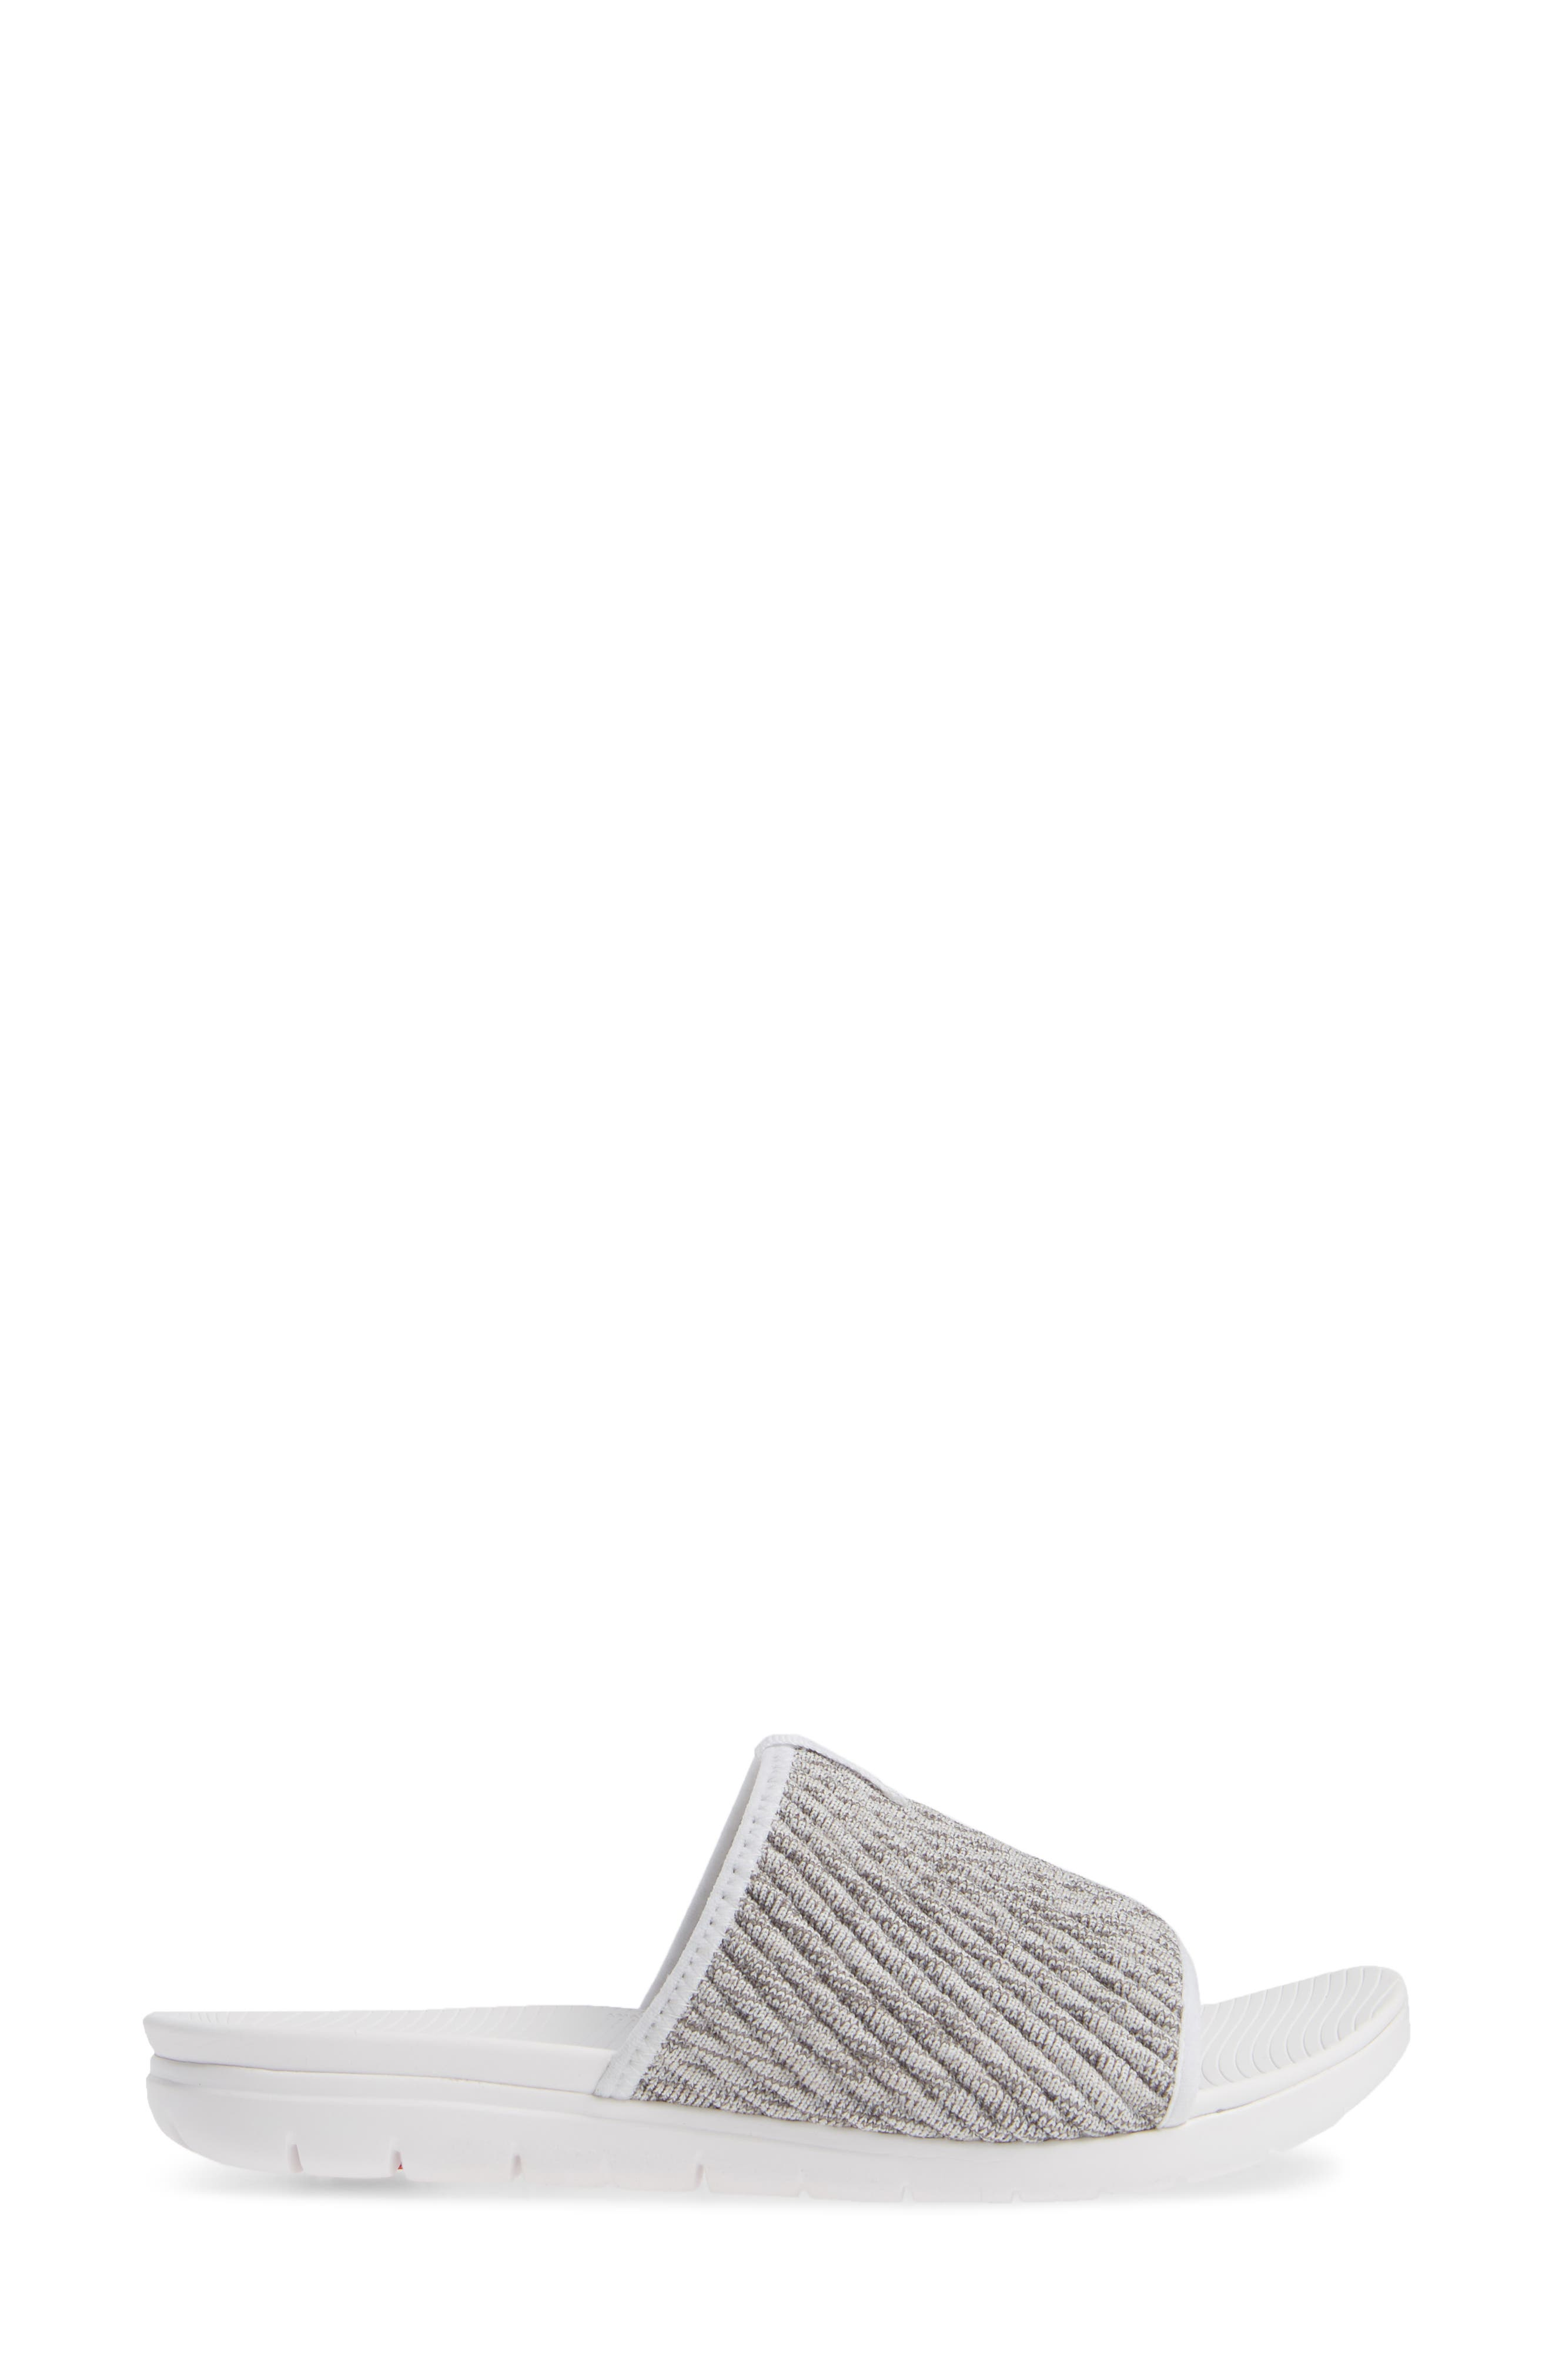 FITFLOP,                             Artknit Slide Sandal,                             Alternate thumbnail 3, color,                             URBAN WHITE MIX FABRIC